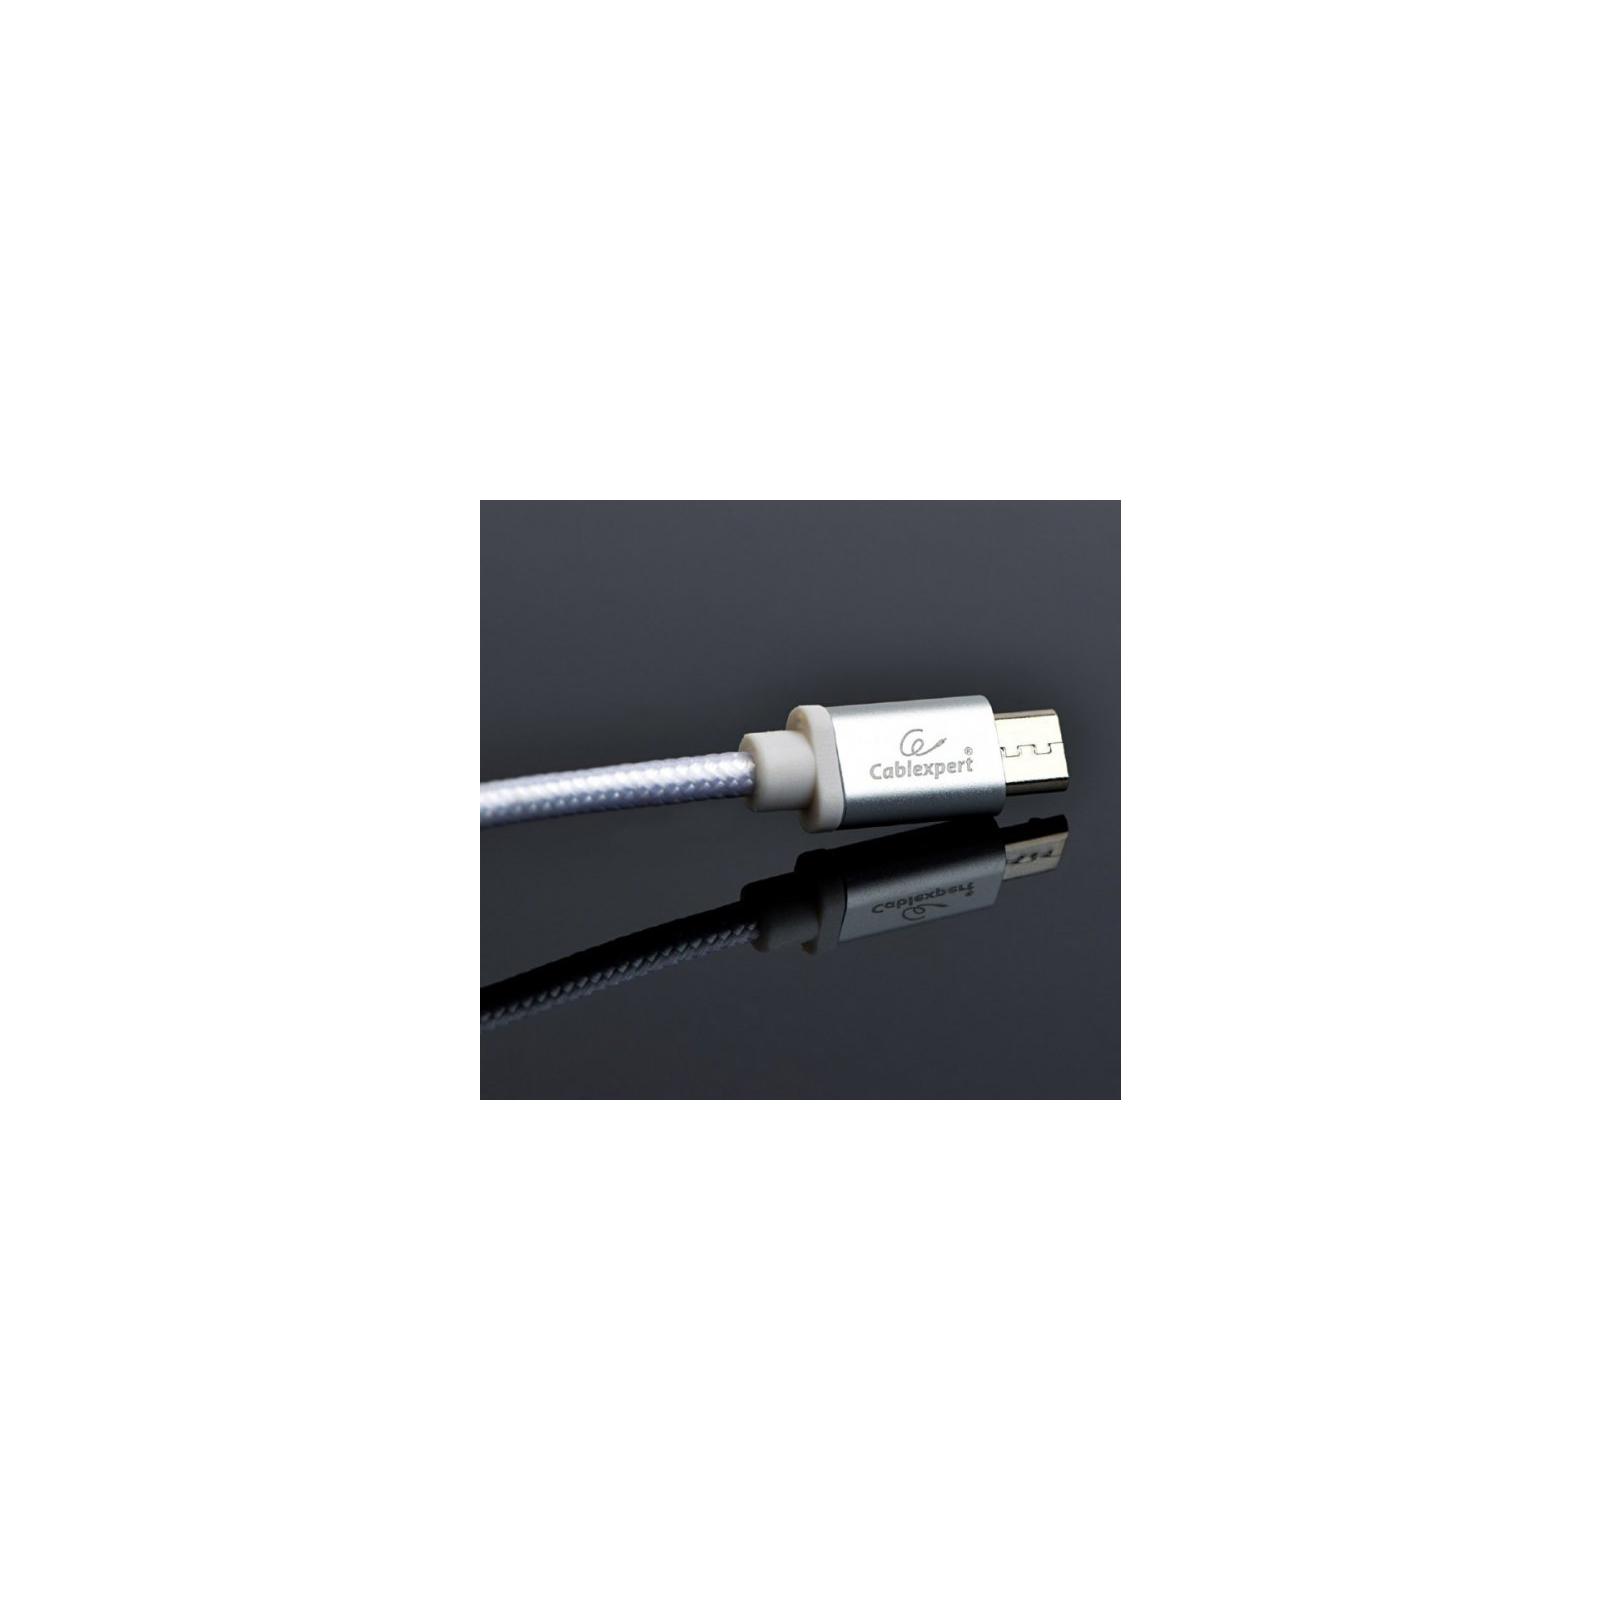 Дата кабель USB 2.0 AM to Micro 5P 1.8m Cablexpert (CCB-mUSB2B-AMBM-6-G) изображение 2